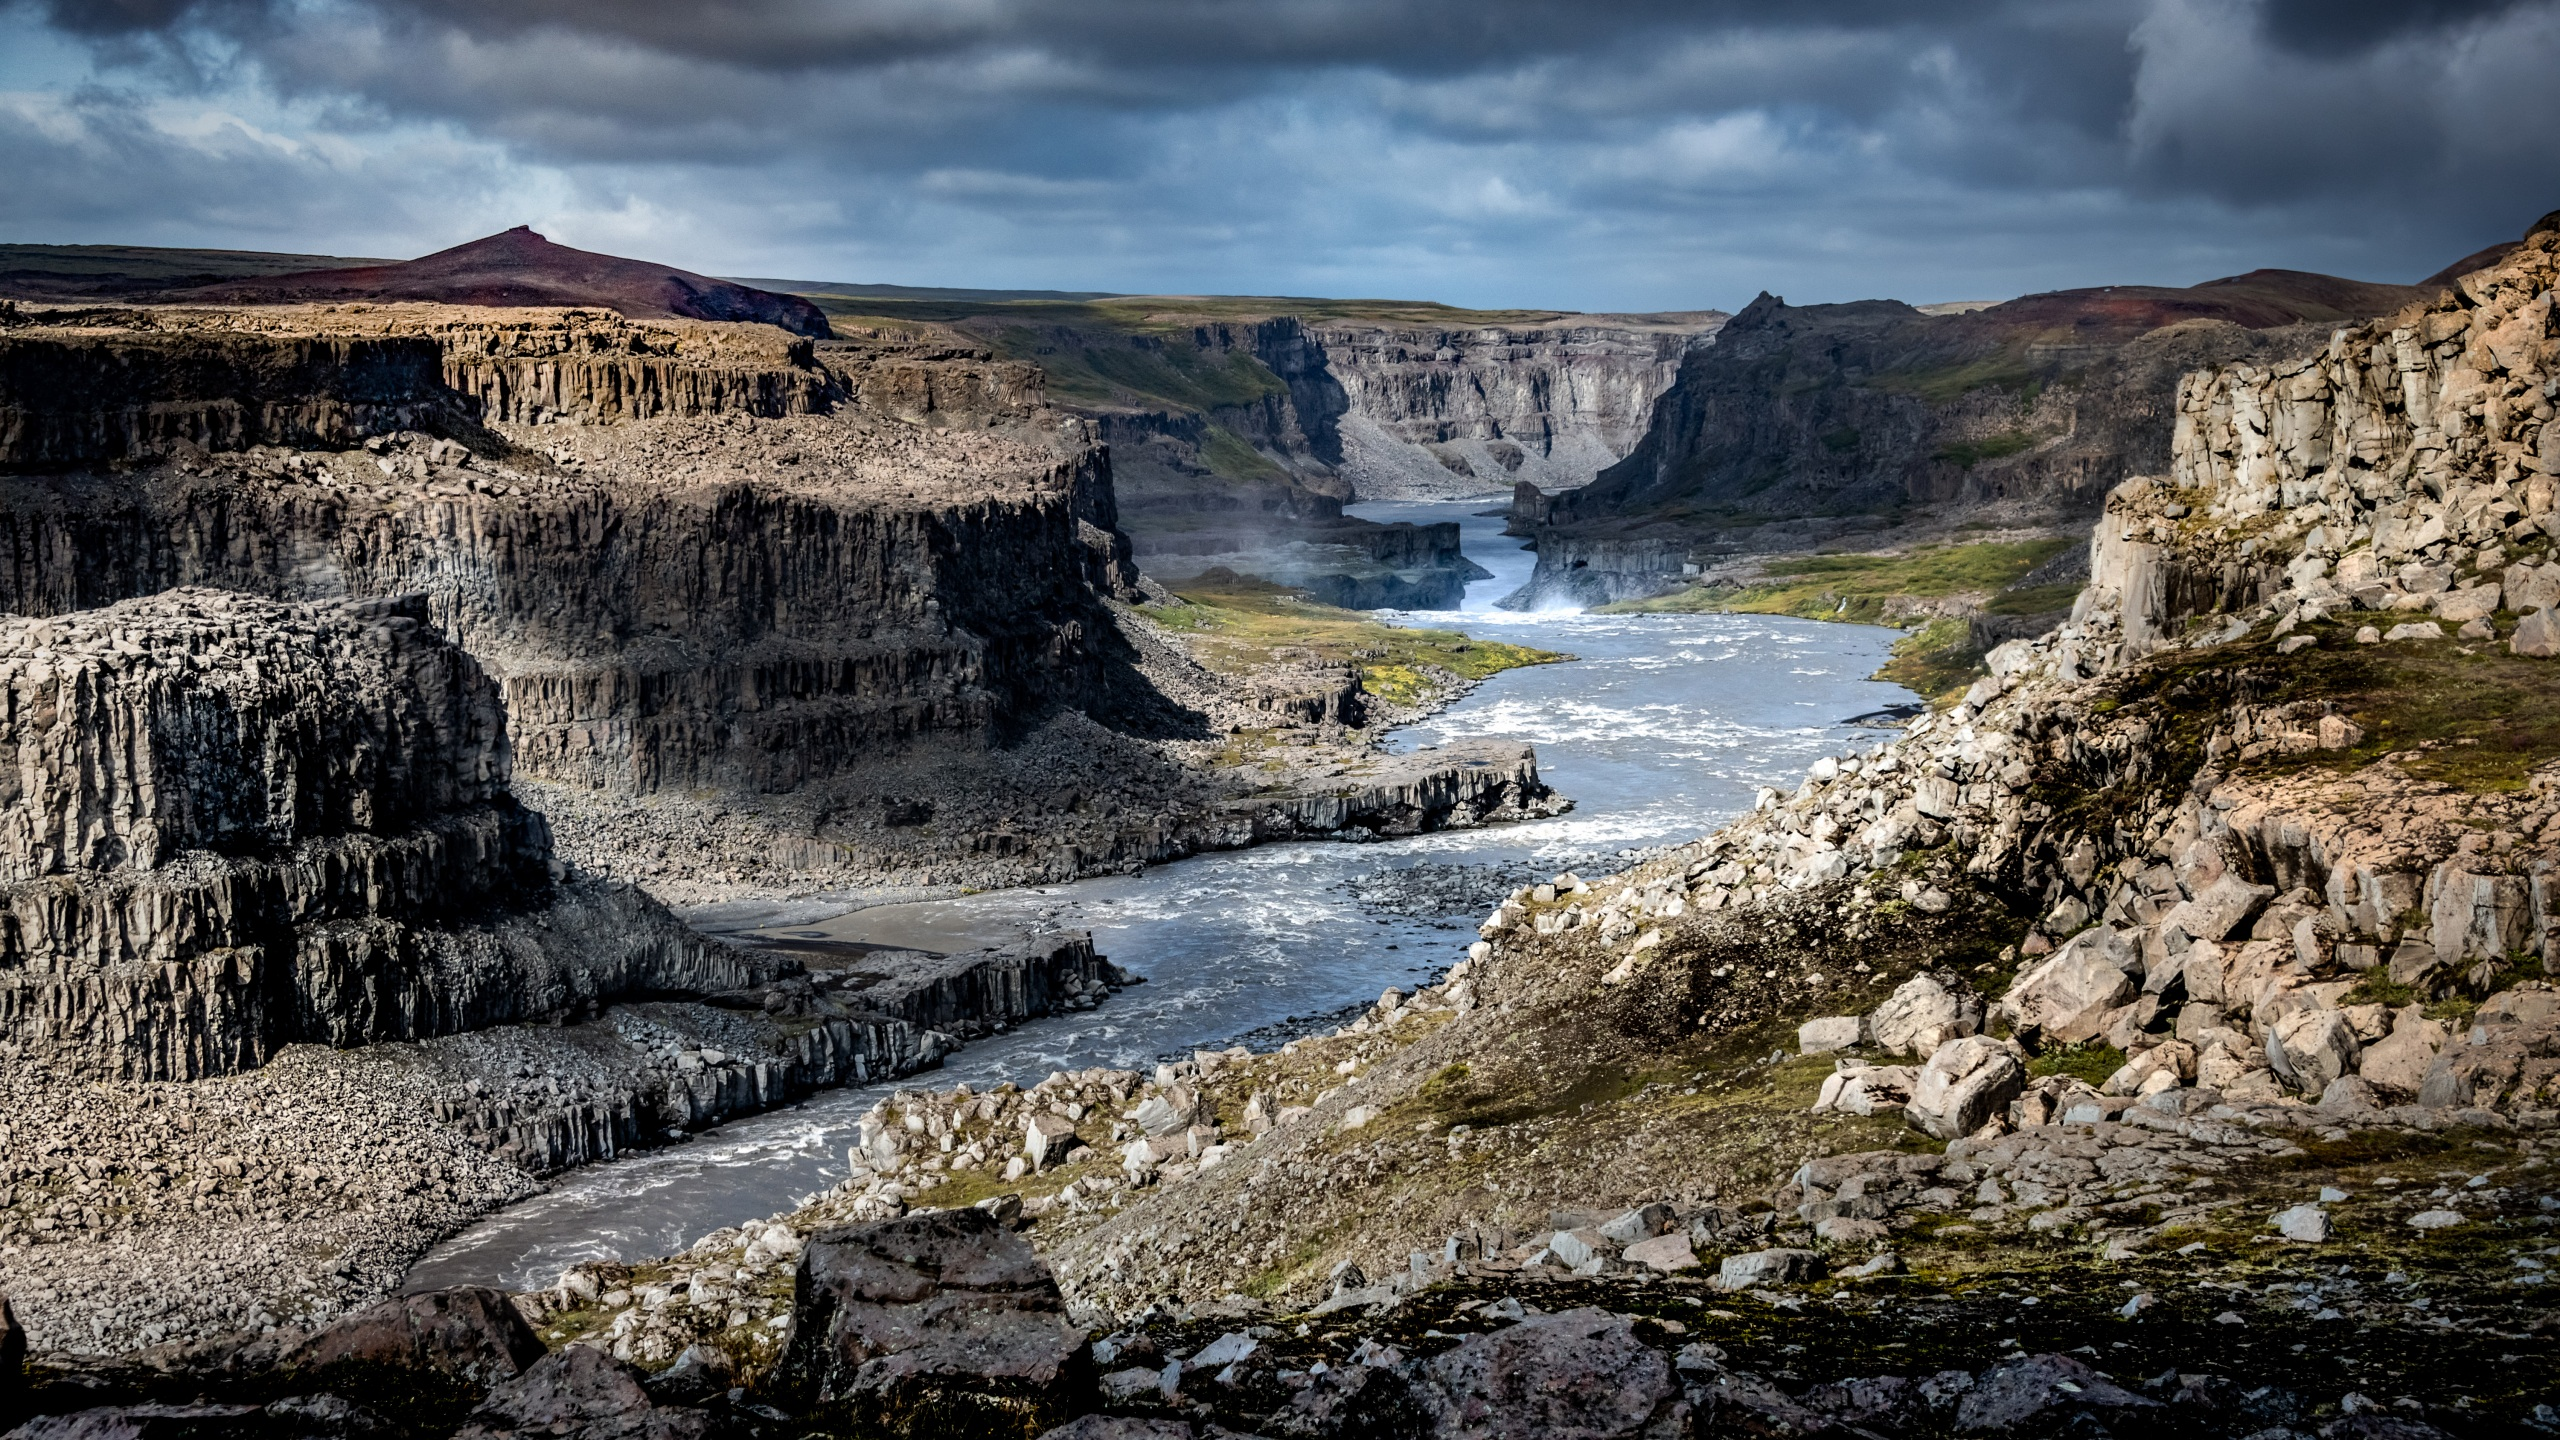 Картинки Исландия Jökulsárgljúfur Canyon Утес каньона Природа Реки Камни 2560x1440 Скала скале скалы Каньон каньоны река речка Камень